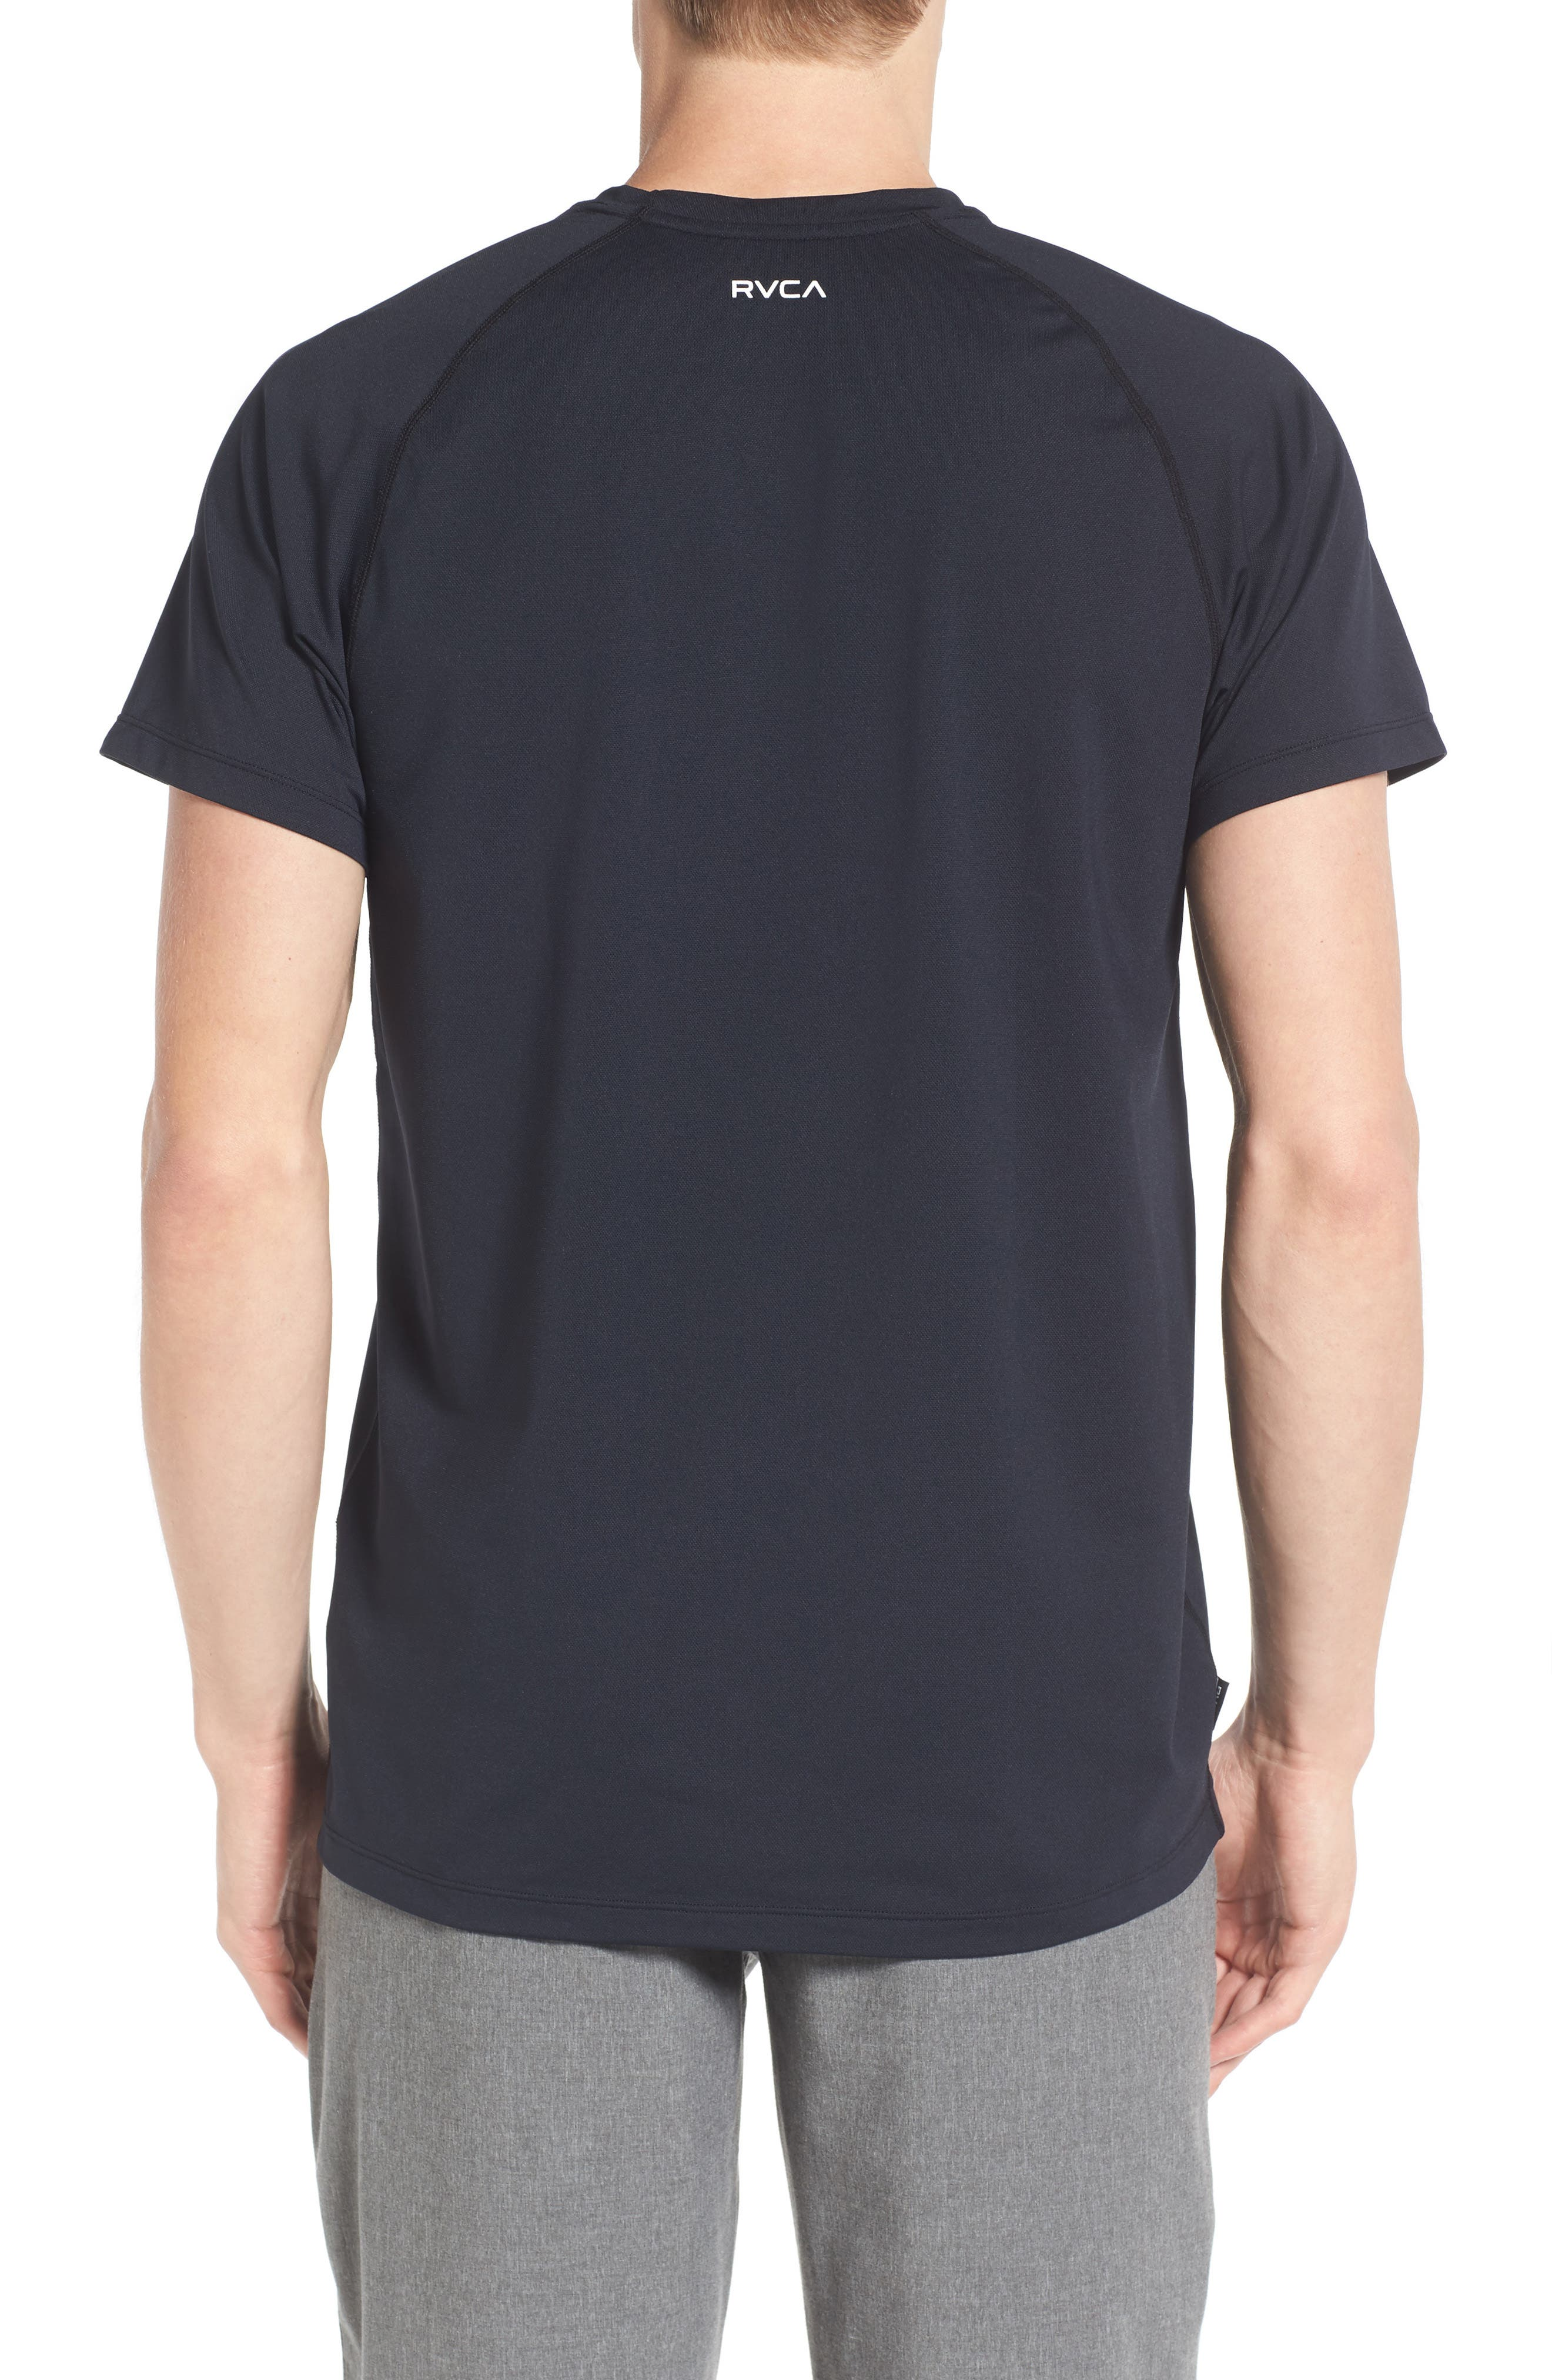 VA All the Way Surf T-Shirt,                             Alternate thumbnail 2, color,                             001